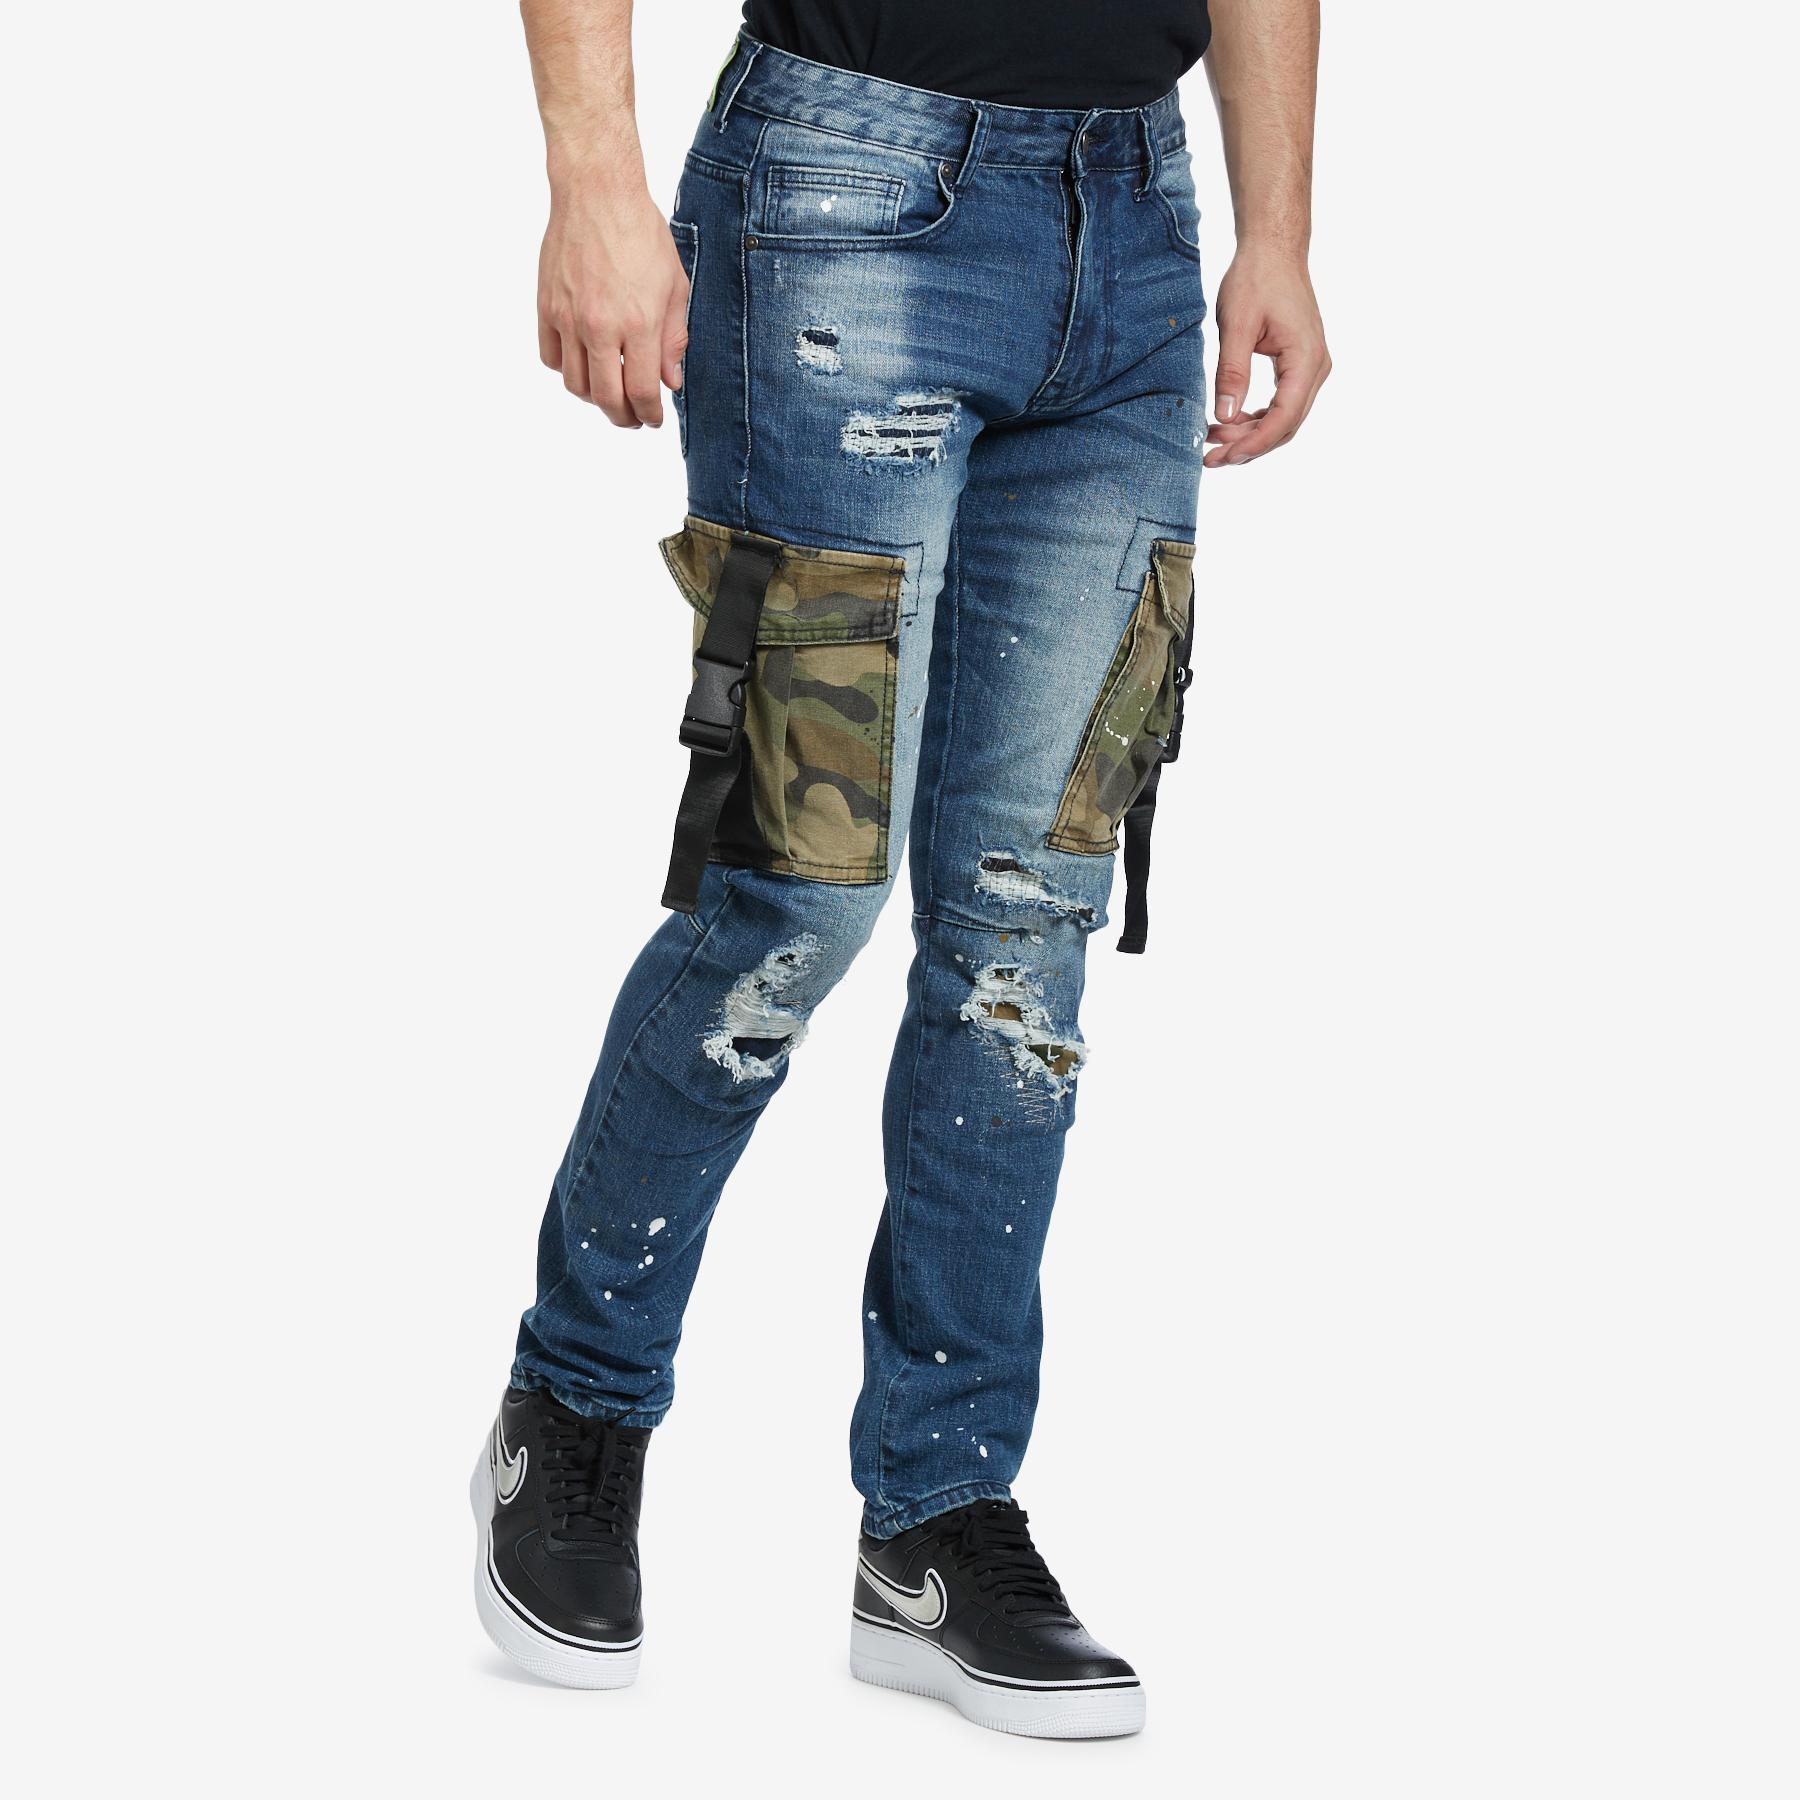 Men's Camo Utility Pocket Jean